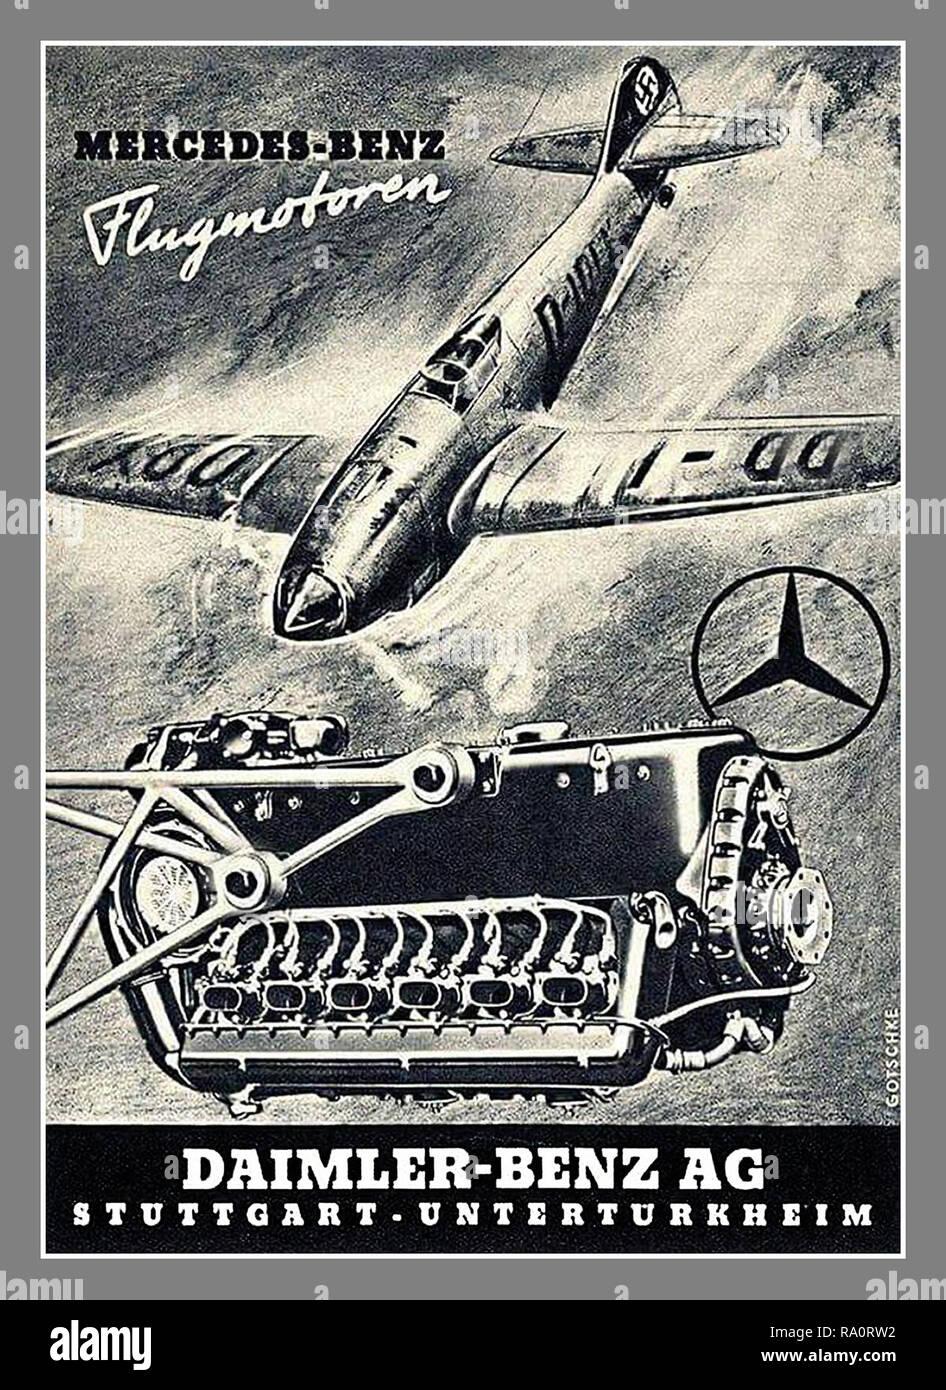 Vintage World War II Nazi Germany Mercedes Poster Press advertisement 1940 WW2 Daimler-Benz Mercedes-Benz Engine for Fighter Aircraft Messerschmitt Bf 109 with Nazi Germany Swastika tail fin Daimler-Benz/Mercedes-Benz Flugmotoren-Aviation engines wartime Nazi Germany advertising. - Stock Image